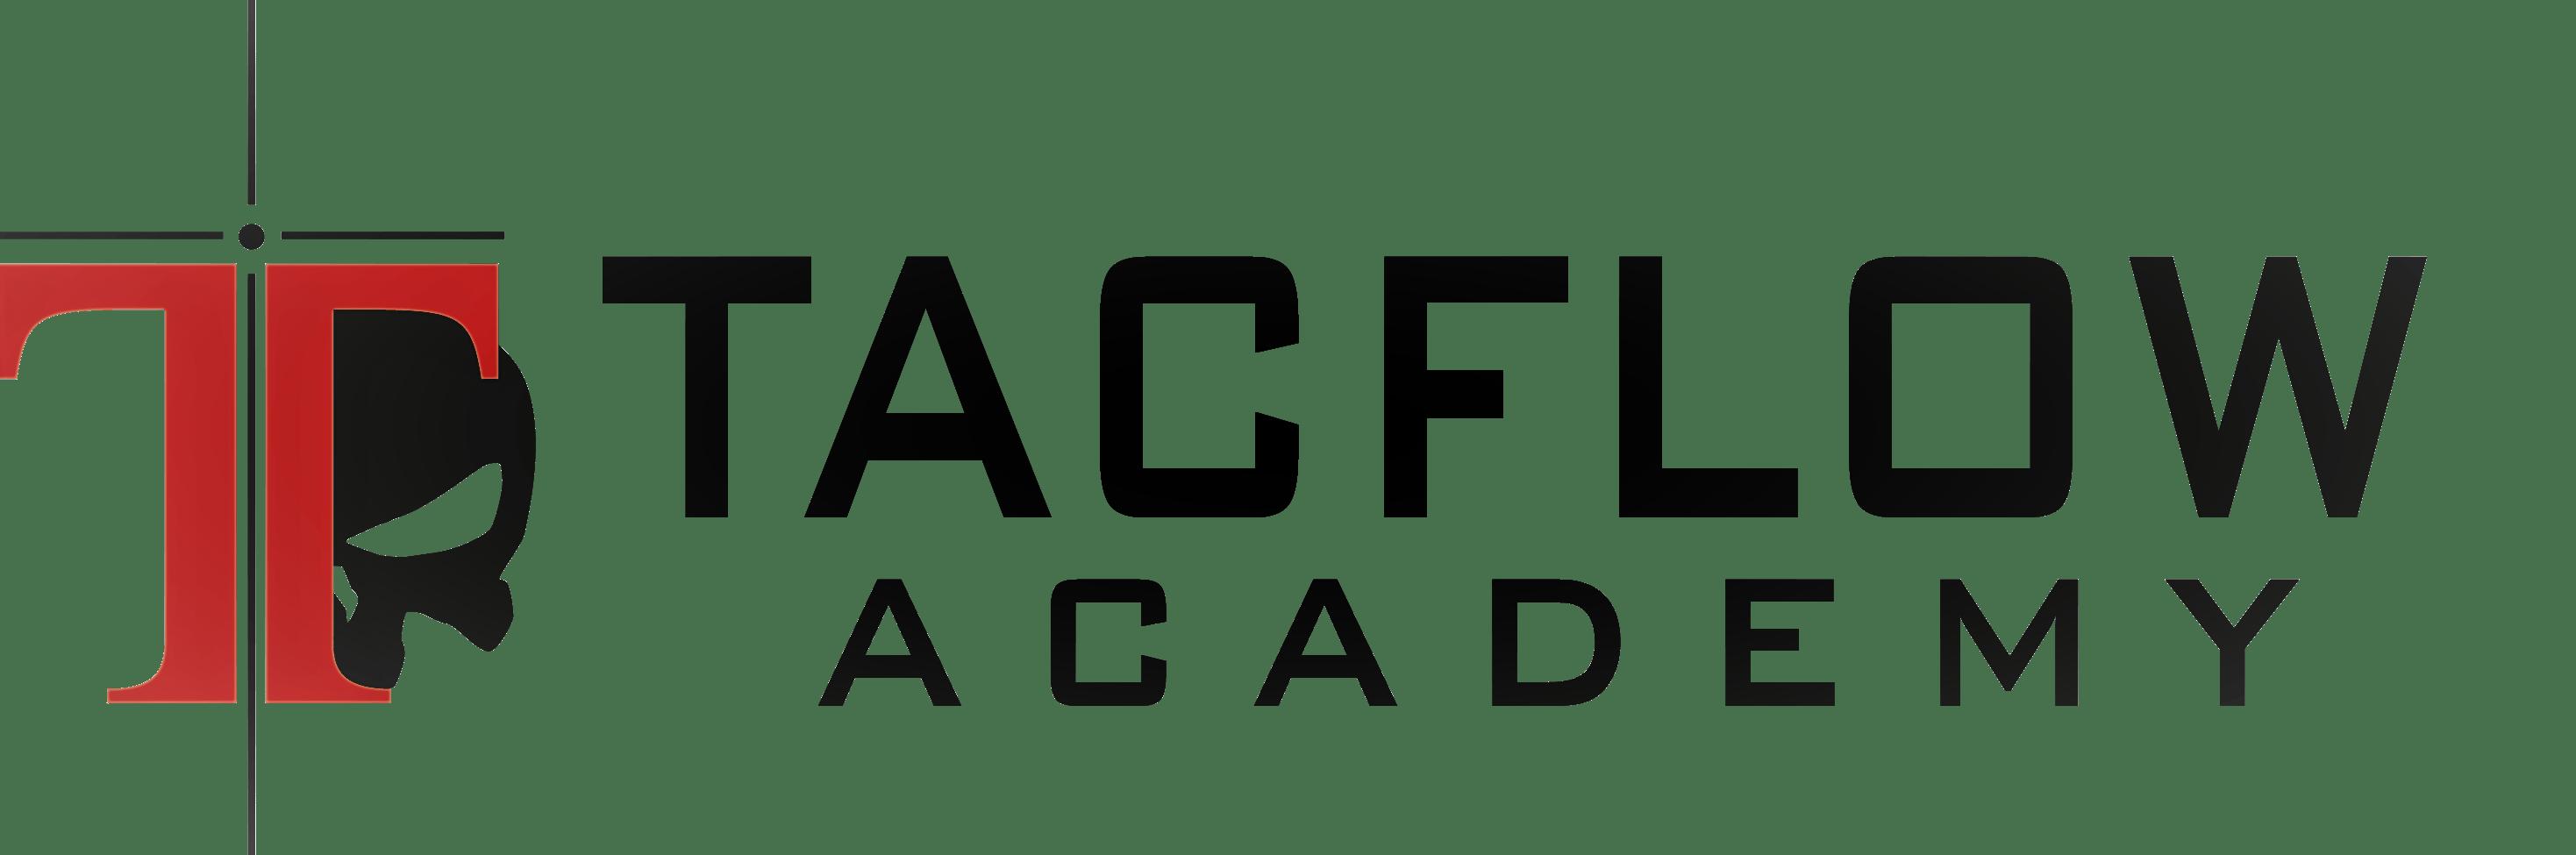 tacflow academy